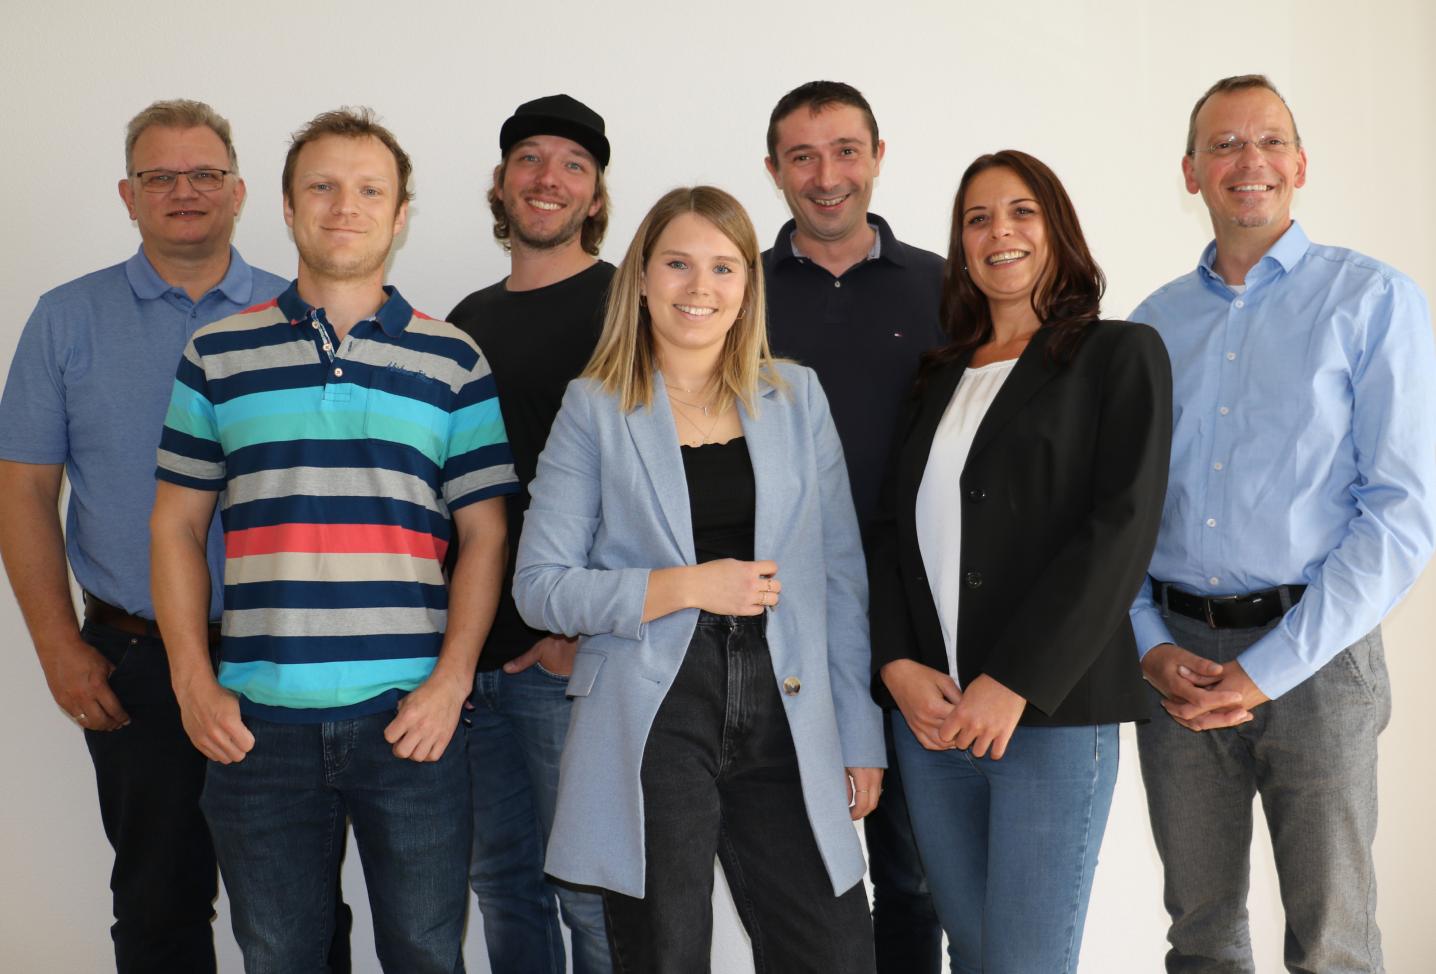 Pathadvice Team members